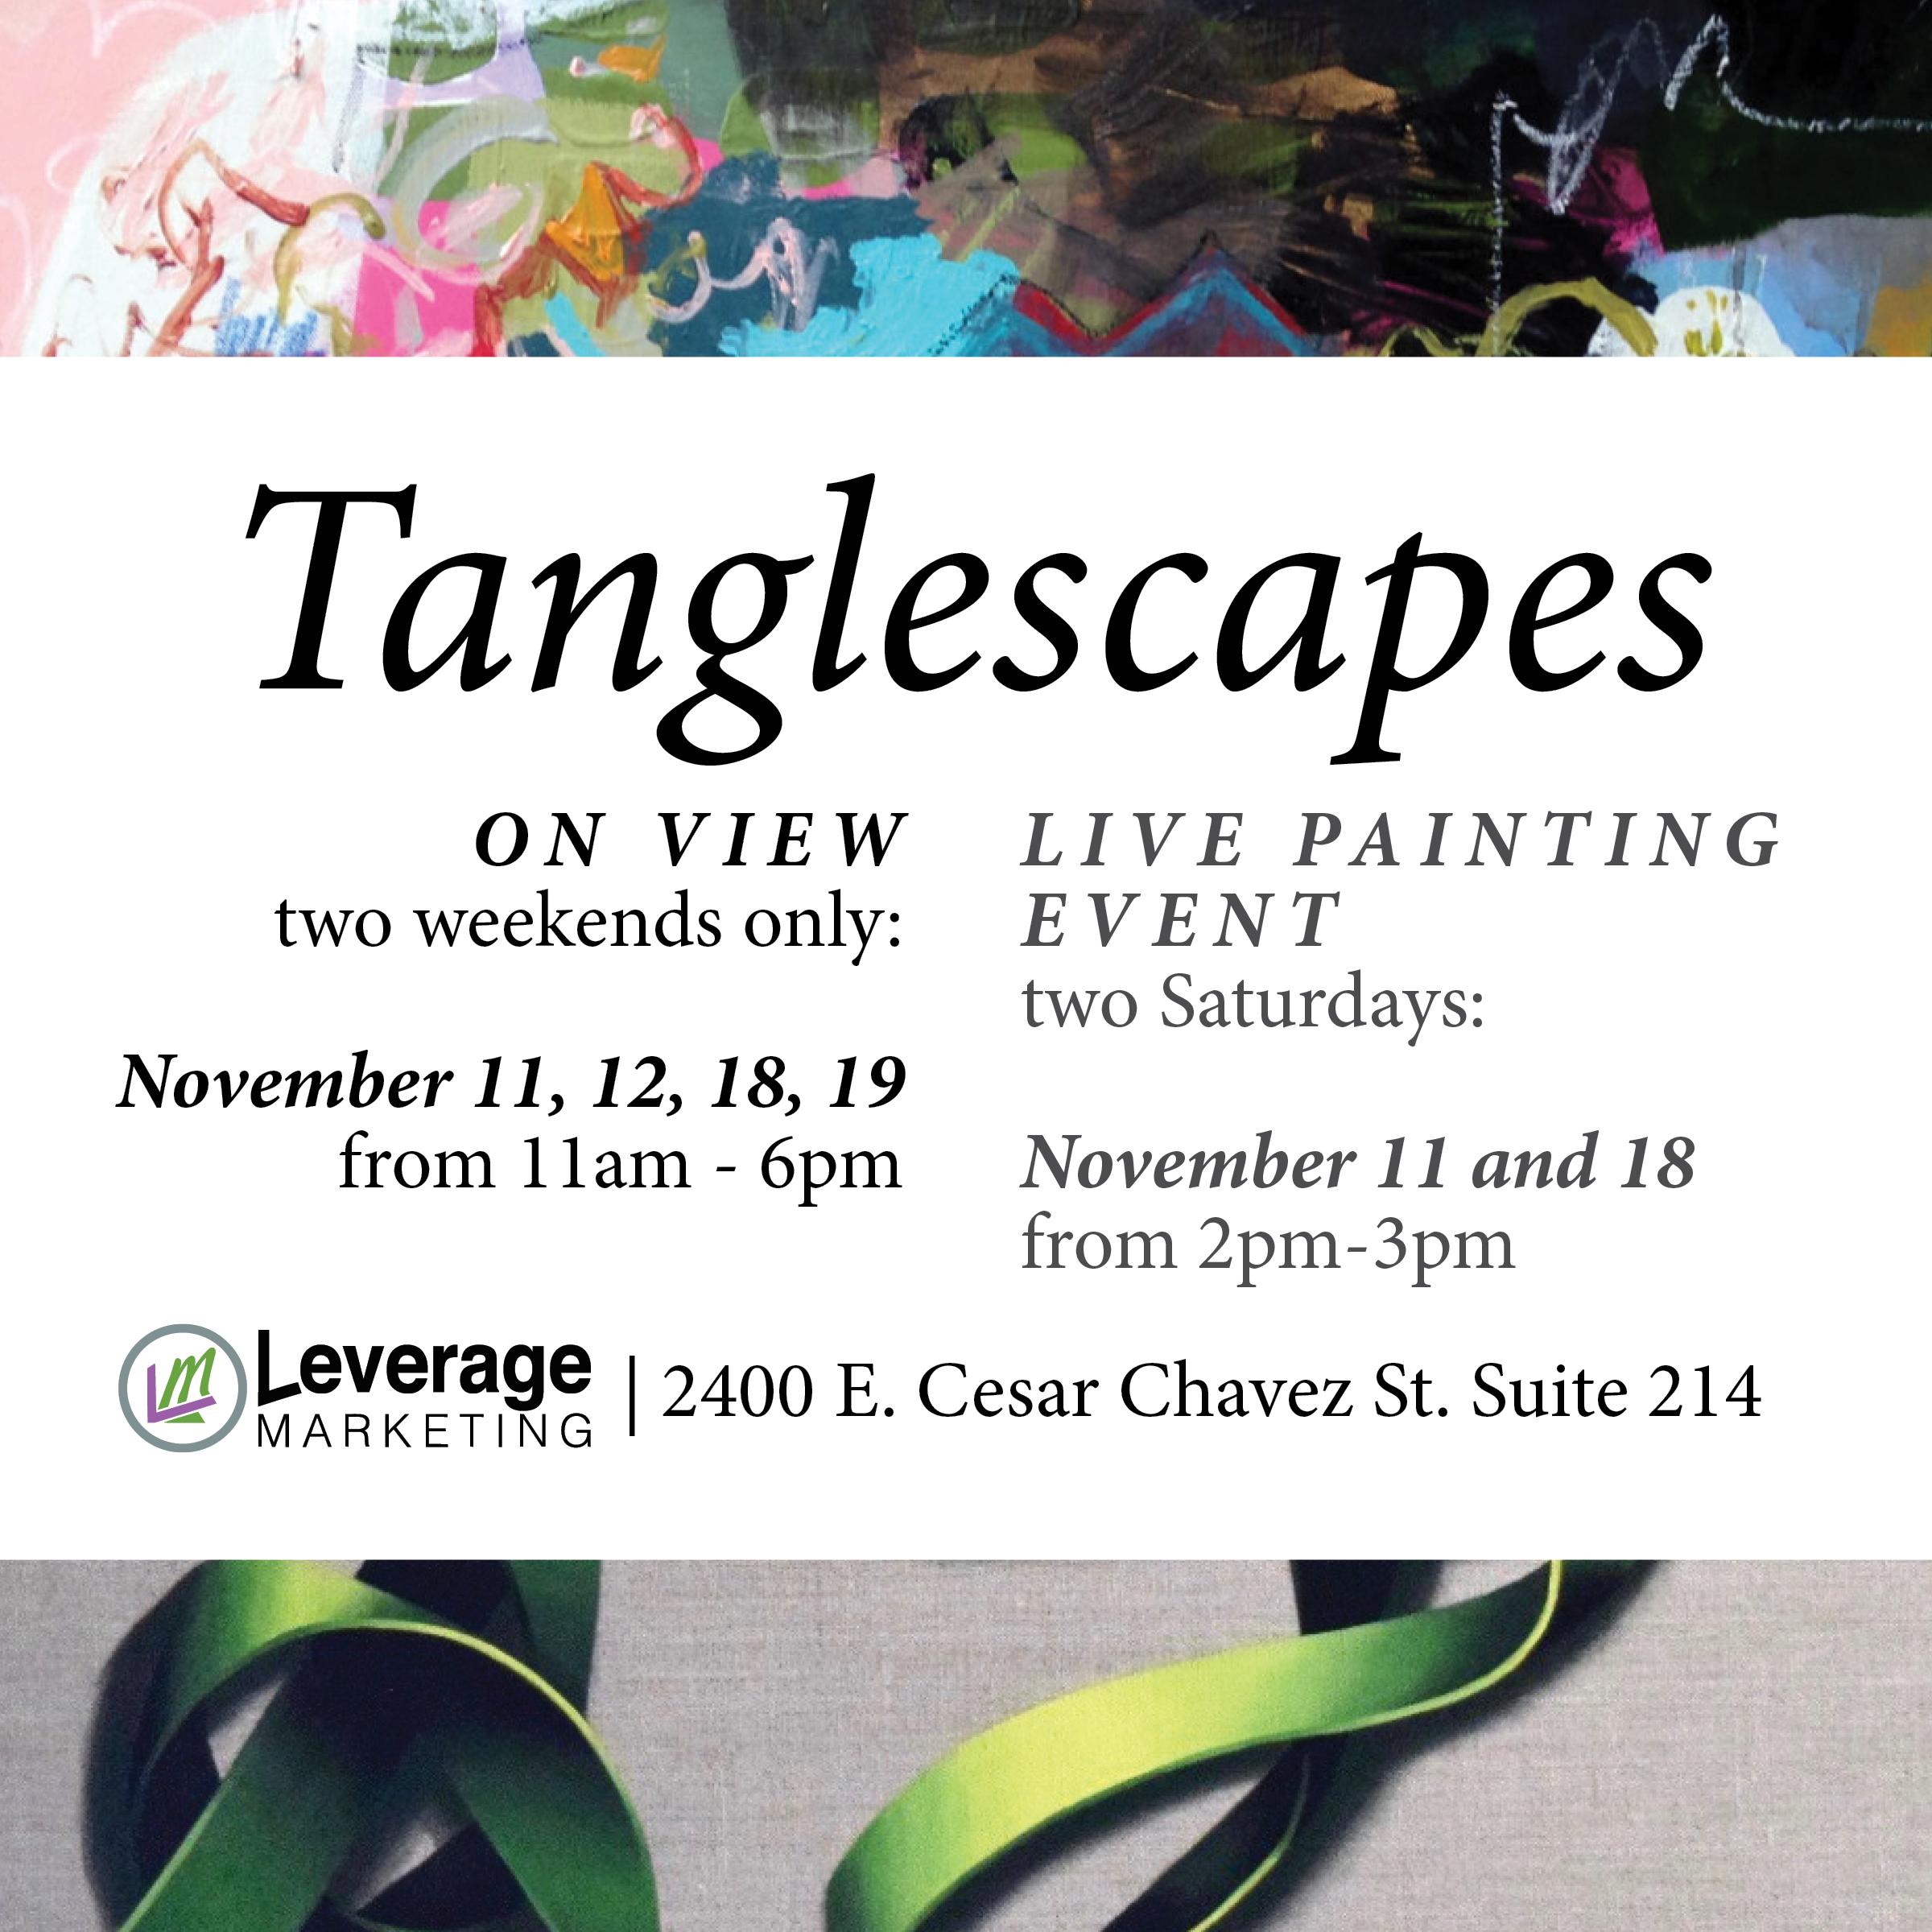 Tanglescapes_social_8_1.png